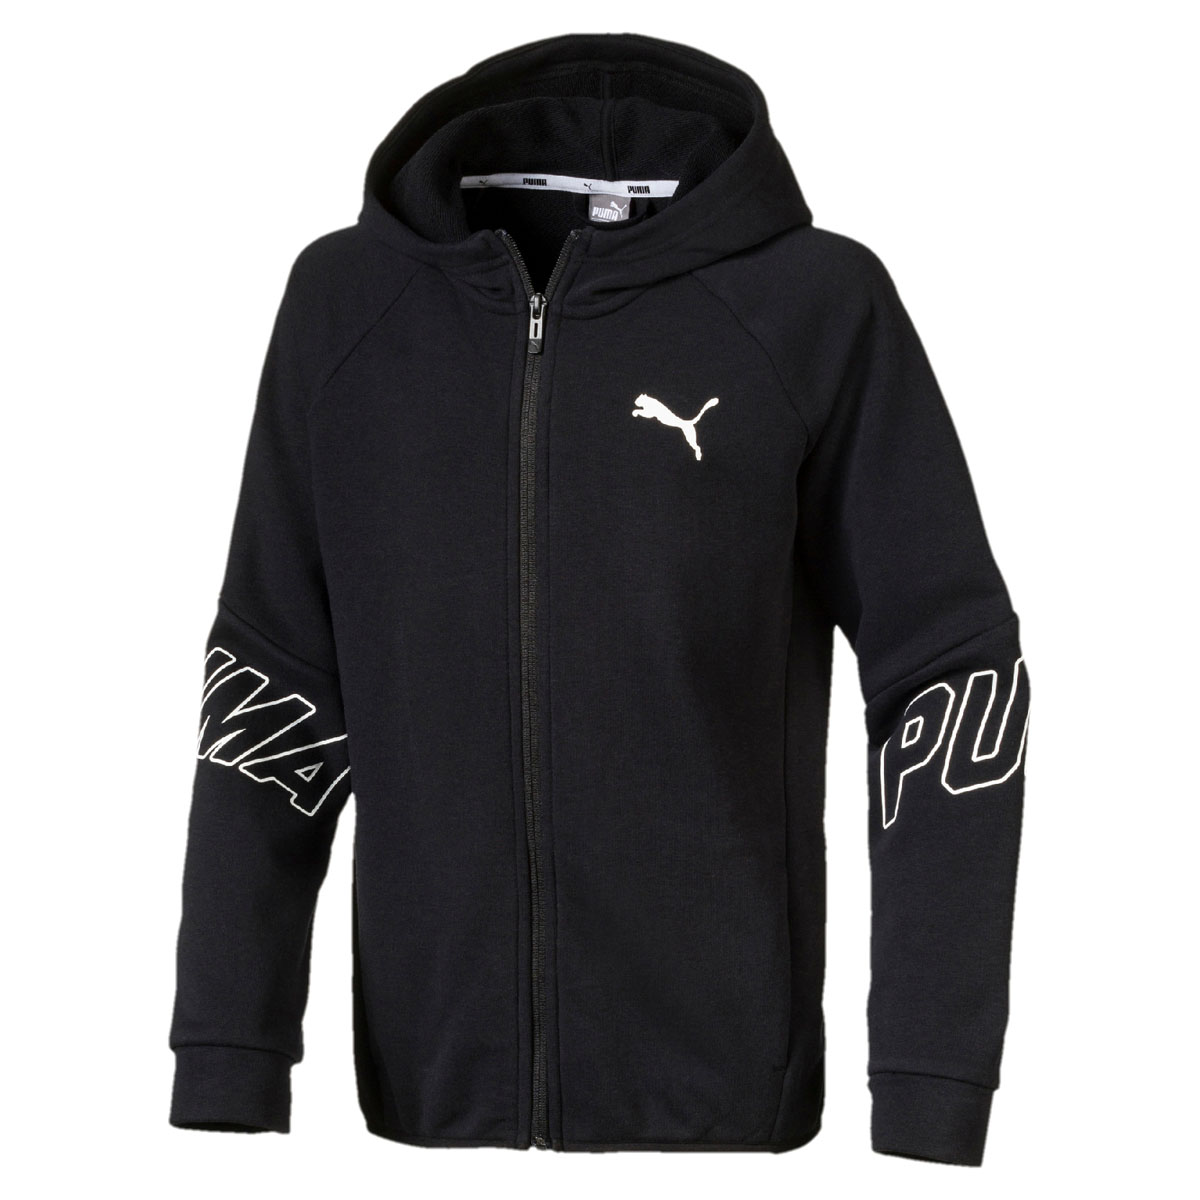 Толстовка для мальчика Puma Style FZ Hoody, цвет: черный. 850176017. Размер 152 original new arrival 2018 puma pace primary fz hoody men s jacket sportswear